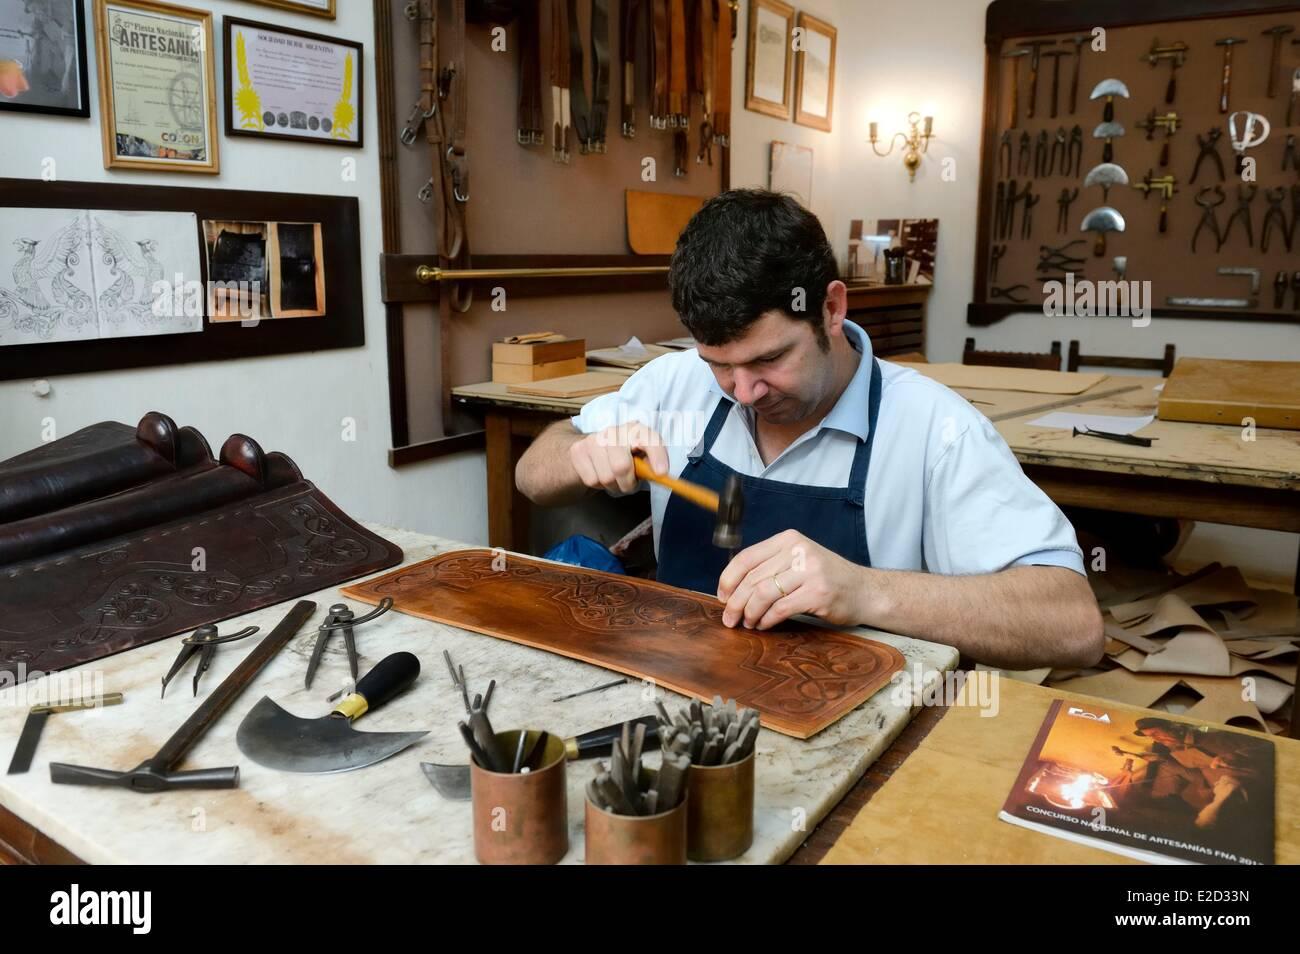 Argentina Buenos Aires Province San Antonio de Areco workshop of the leather craftsman Martin Alvarez hammering - Stock Image